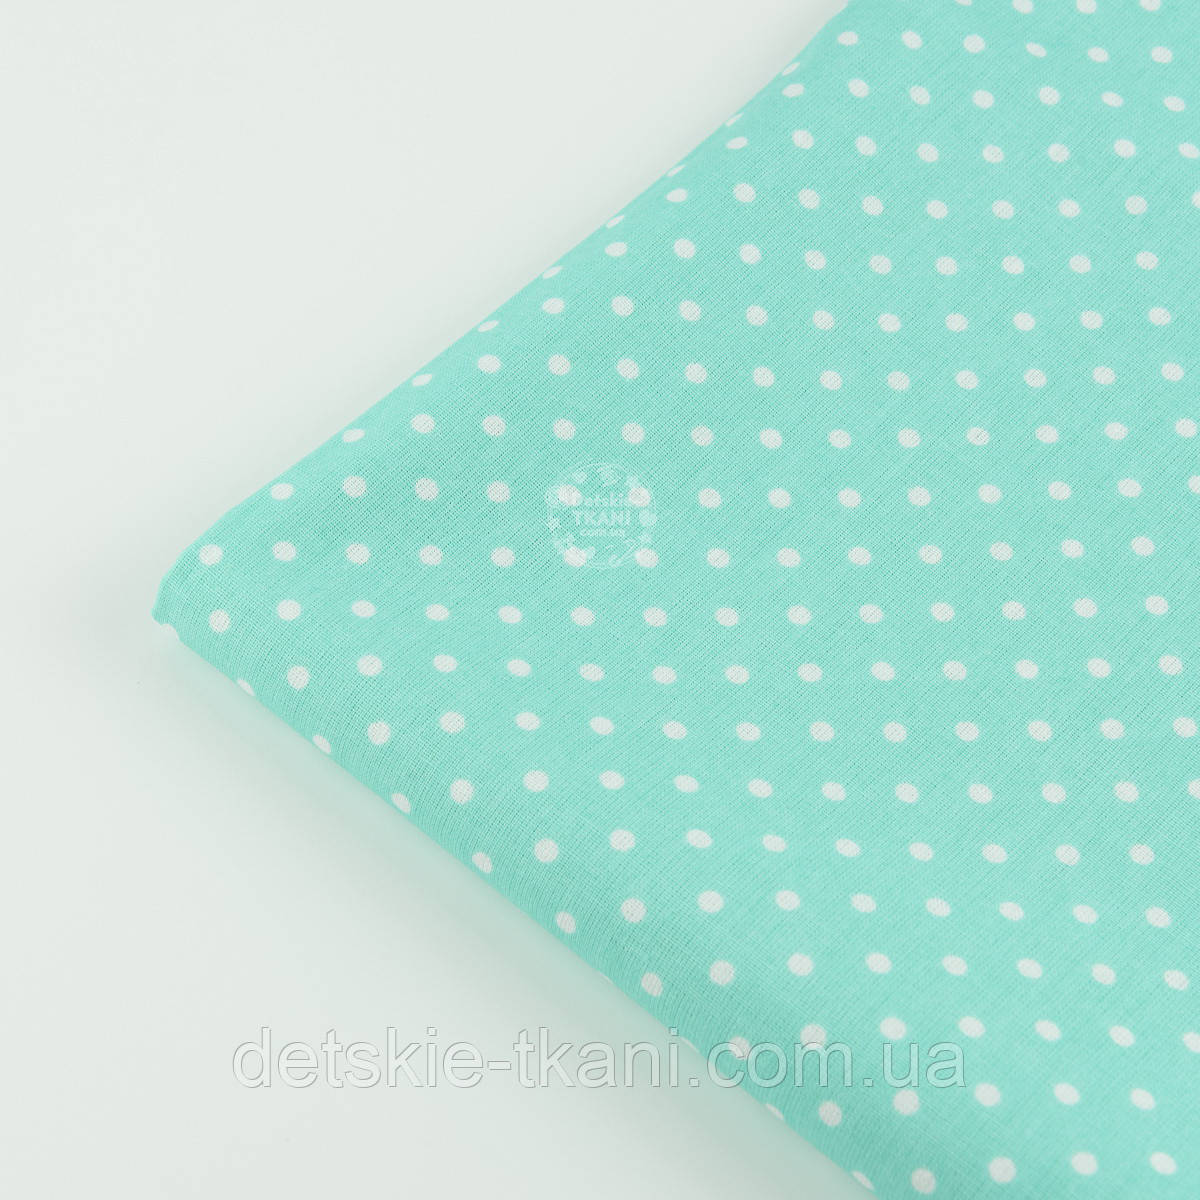 Лоскут ткани №804 с белым горошком 4 мм на мятном фоне